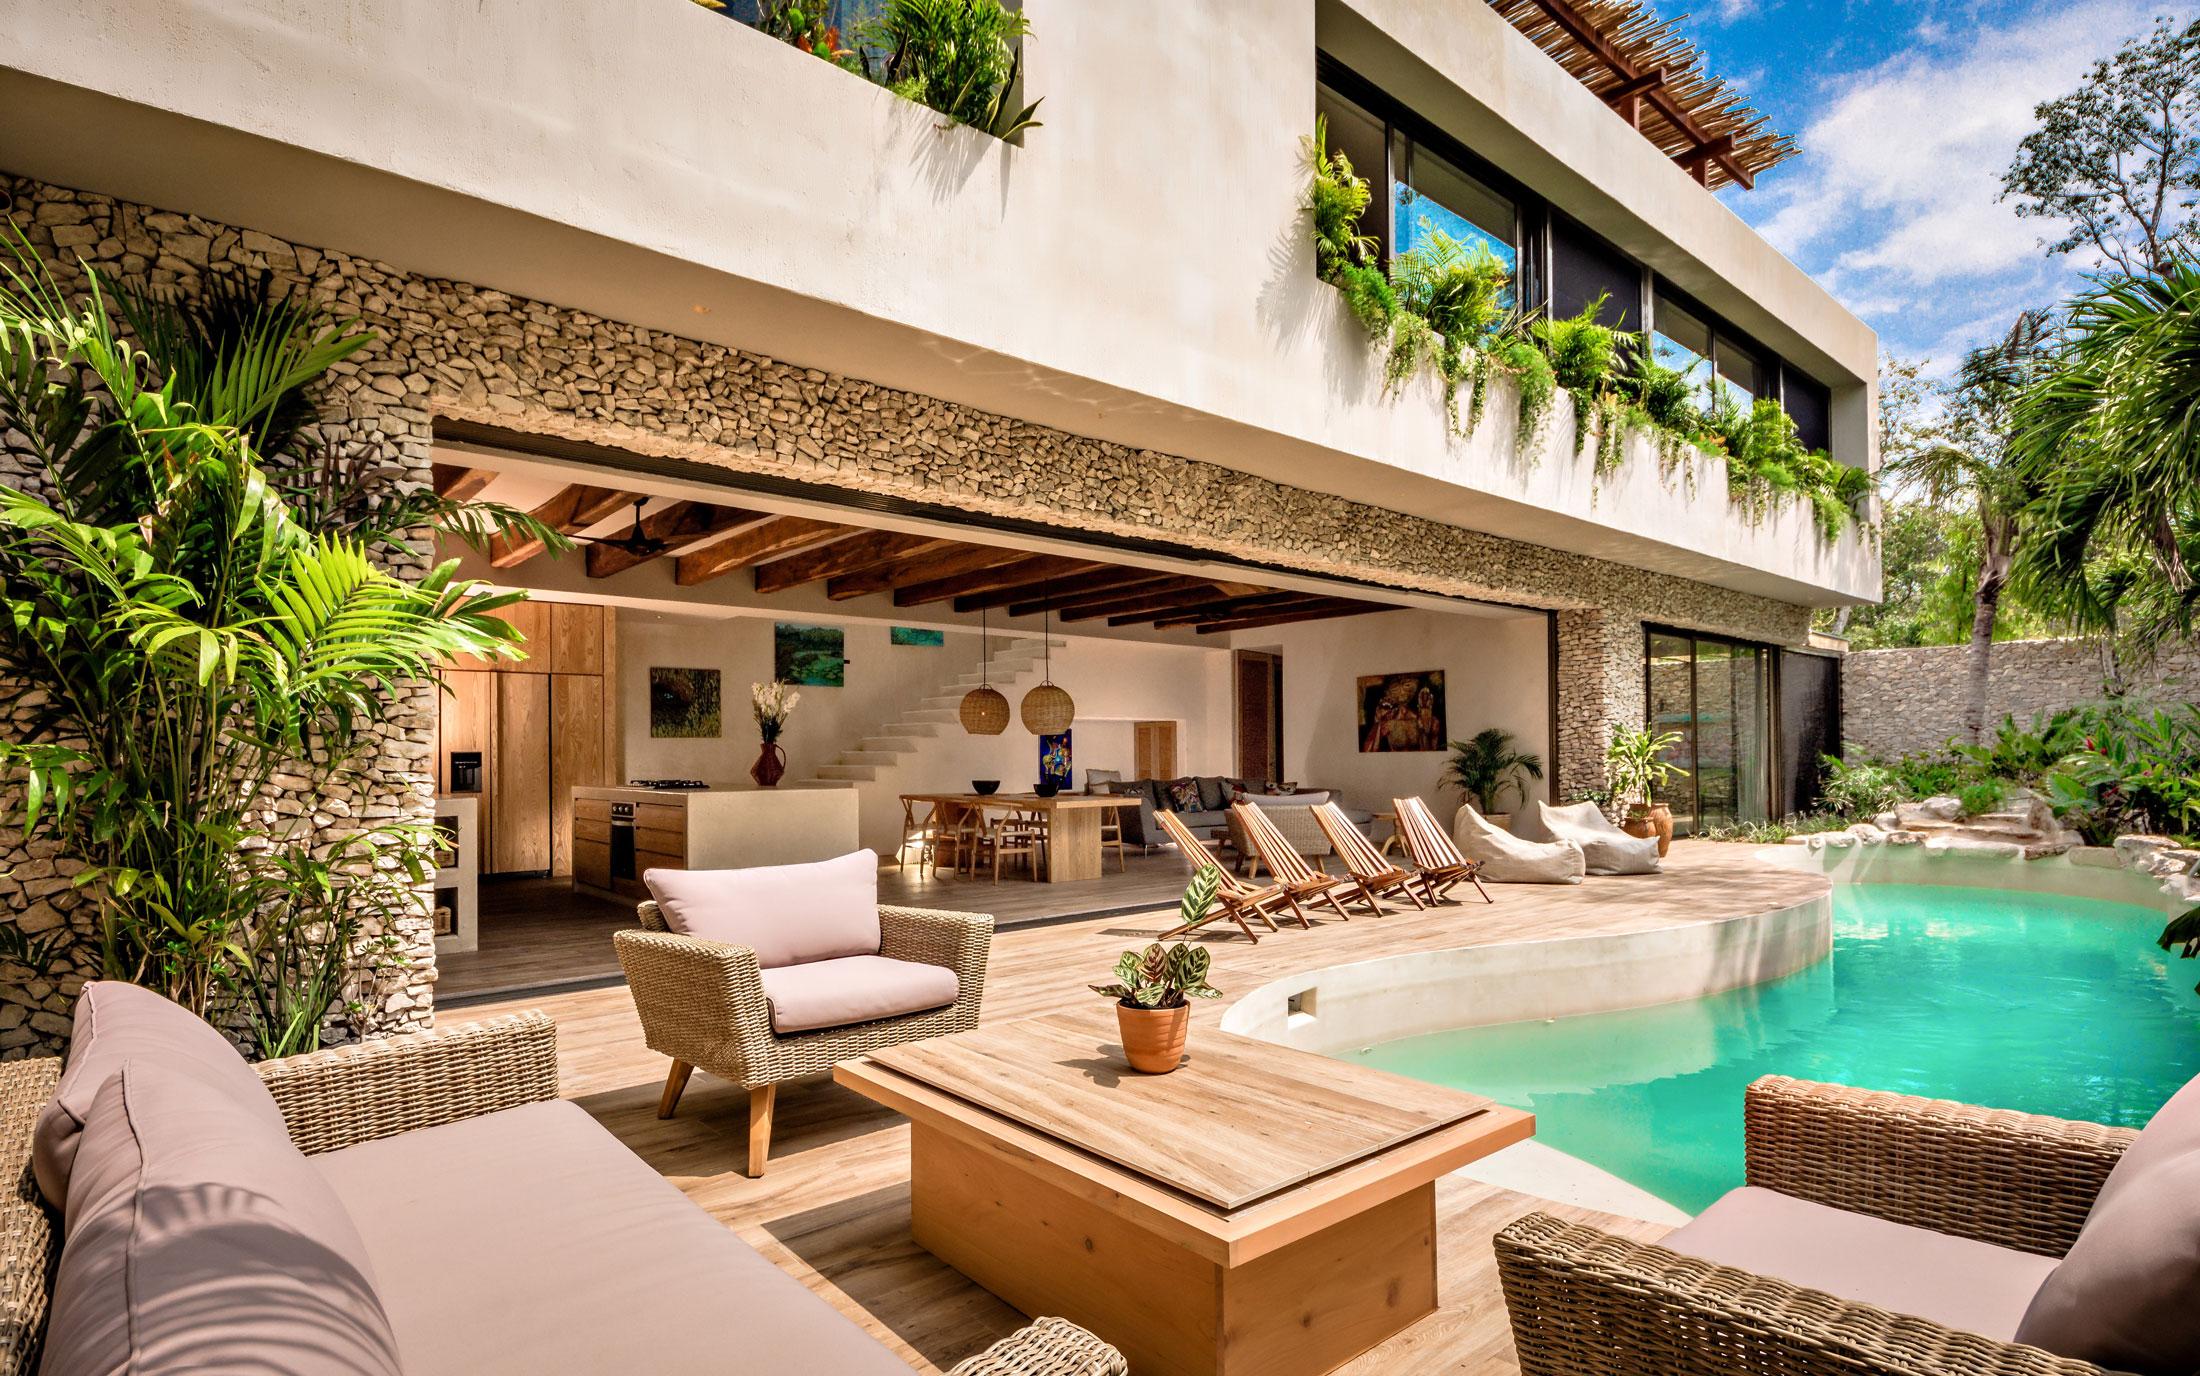 Maya_Luxe_Riviera_Maya_Luxury_Villas_Experiences_Tulum_Town_4_Bedrooms_Villa_Verde_1 (1).jpg